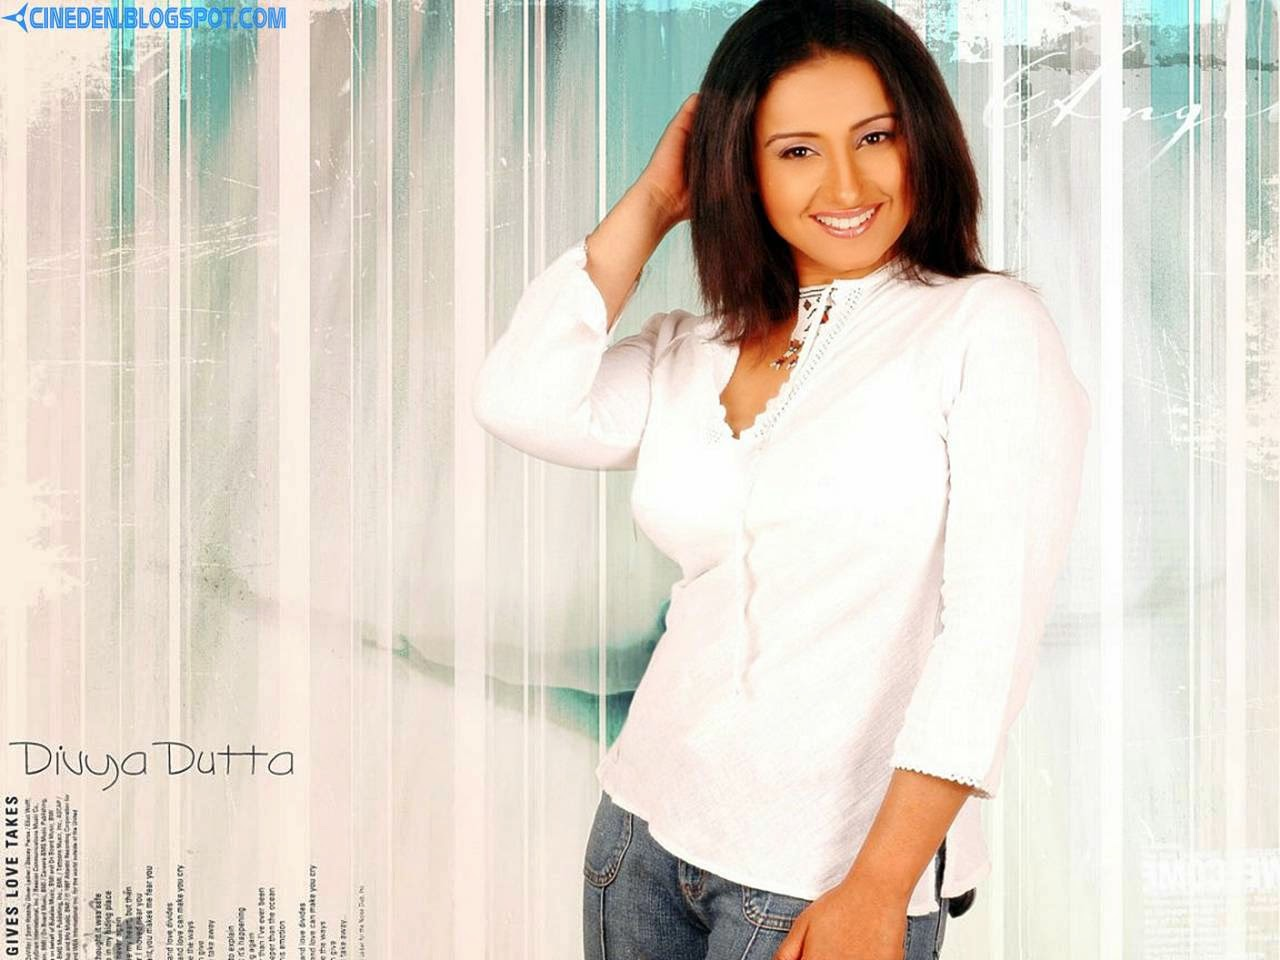 I am marriage material: Divya Dutta - CineDen